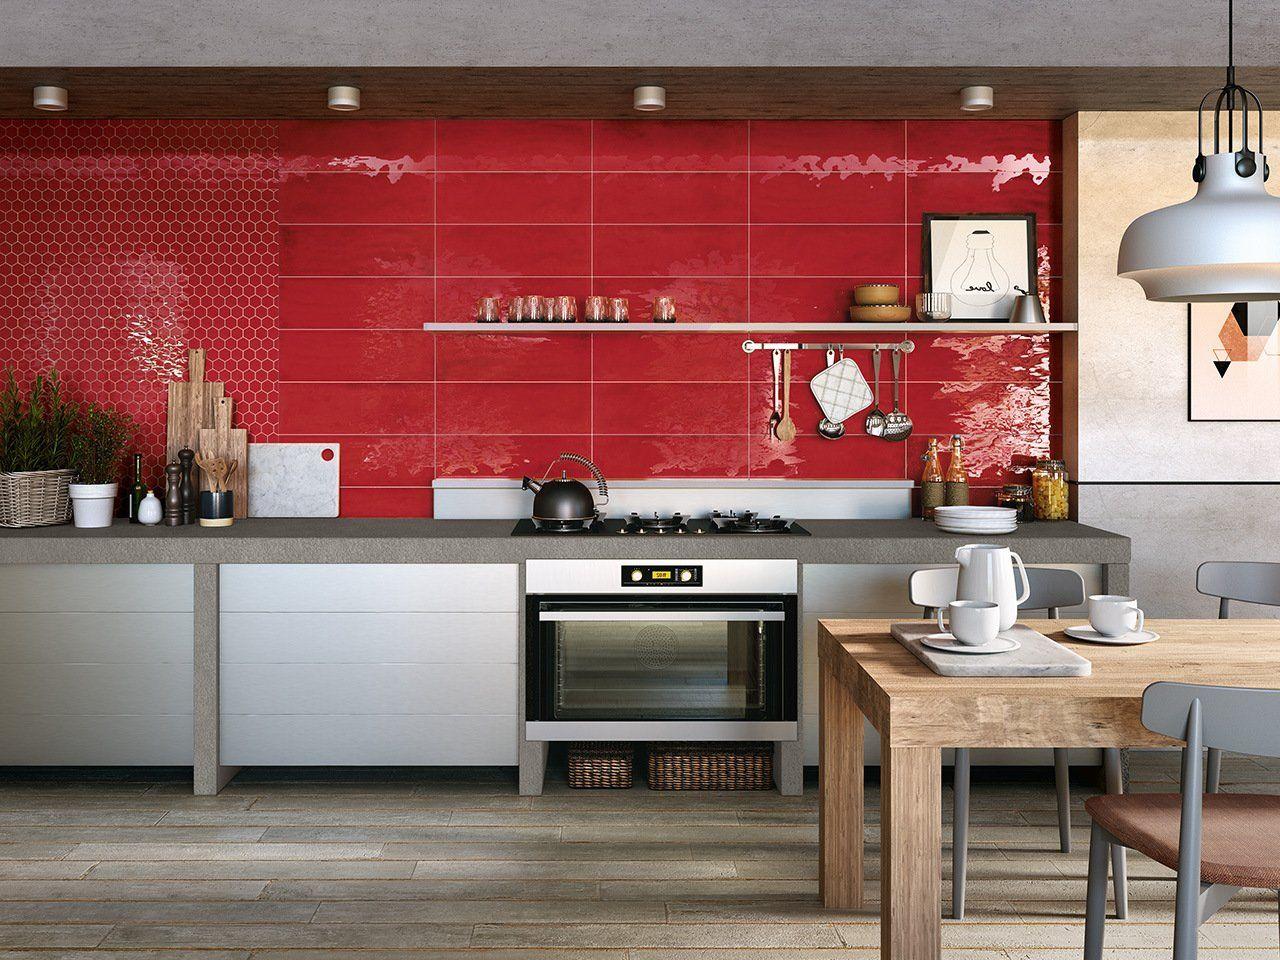 Mosaico intinta rubino lucido 28,8x33,3 | Cucine, Tendenze ...